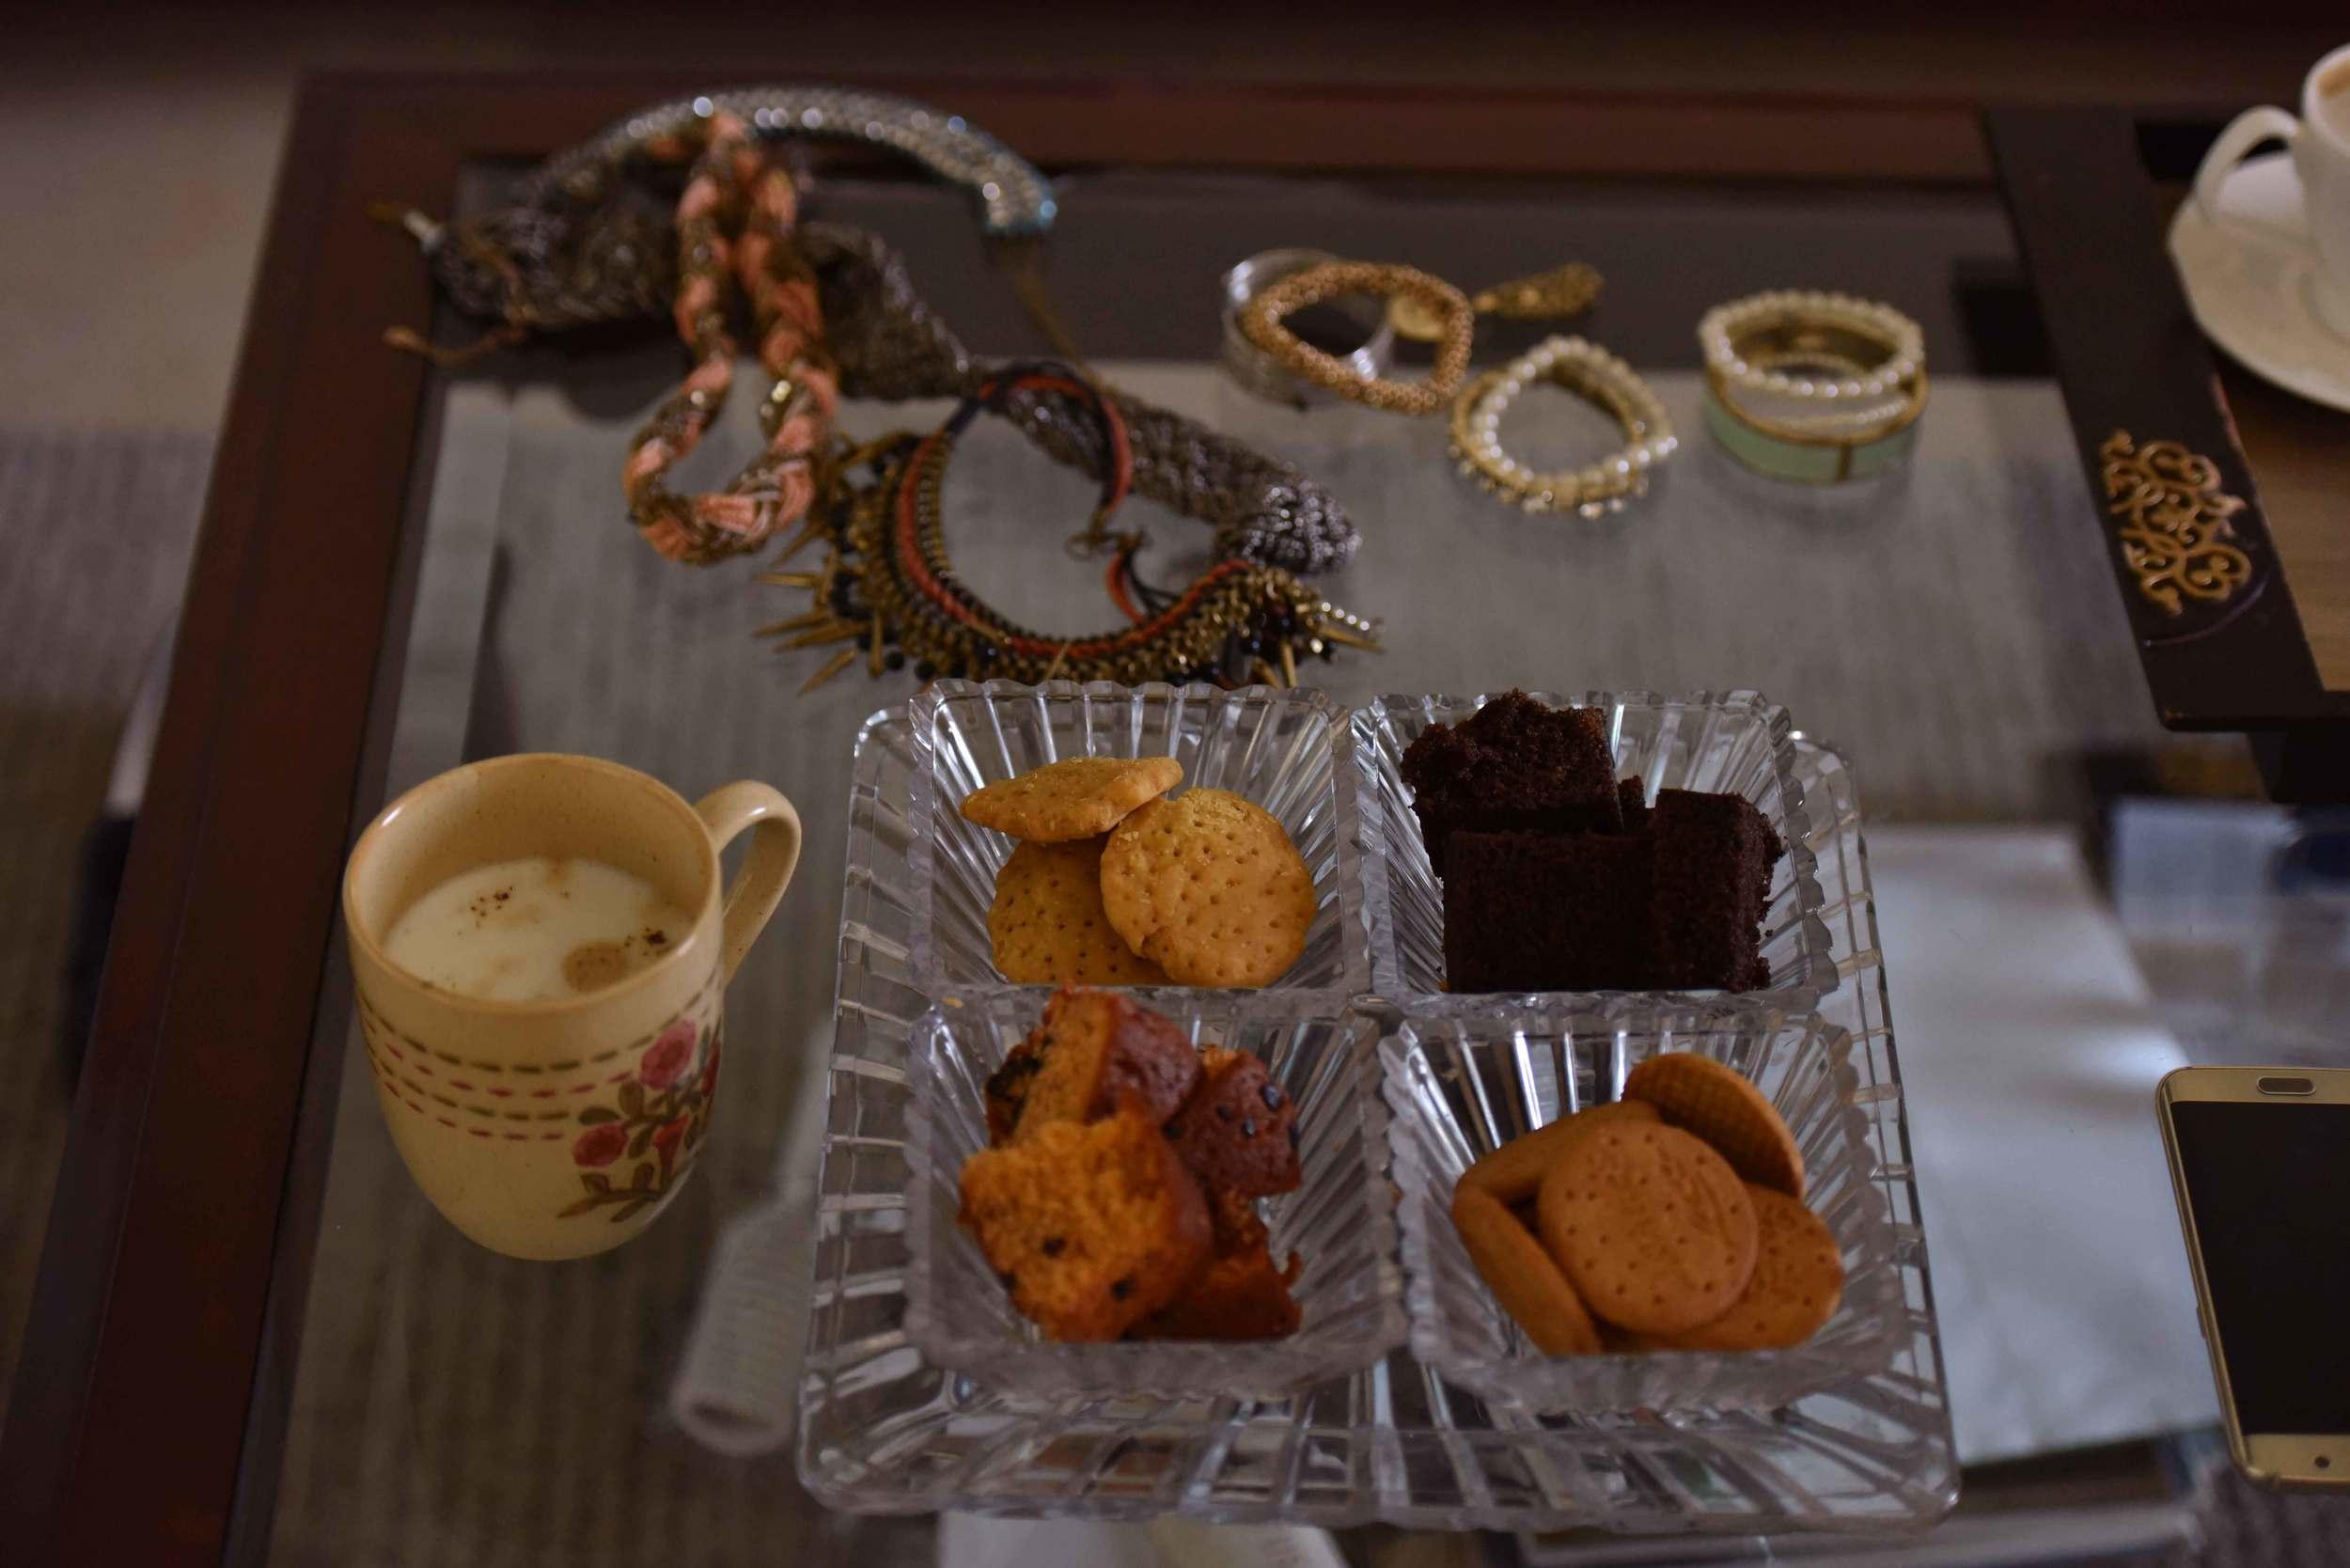 Cookies and coffee make a photoshoot fun! Image@gunjanvirk